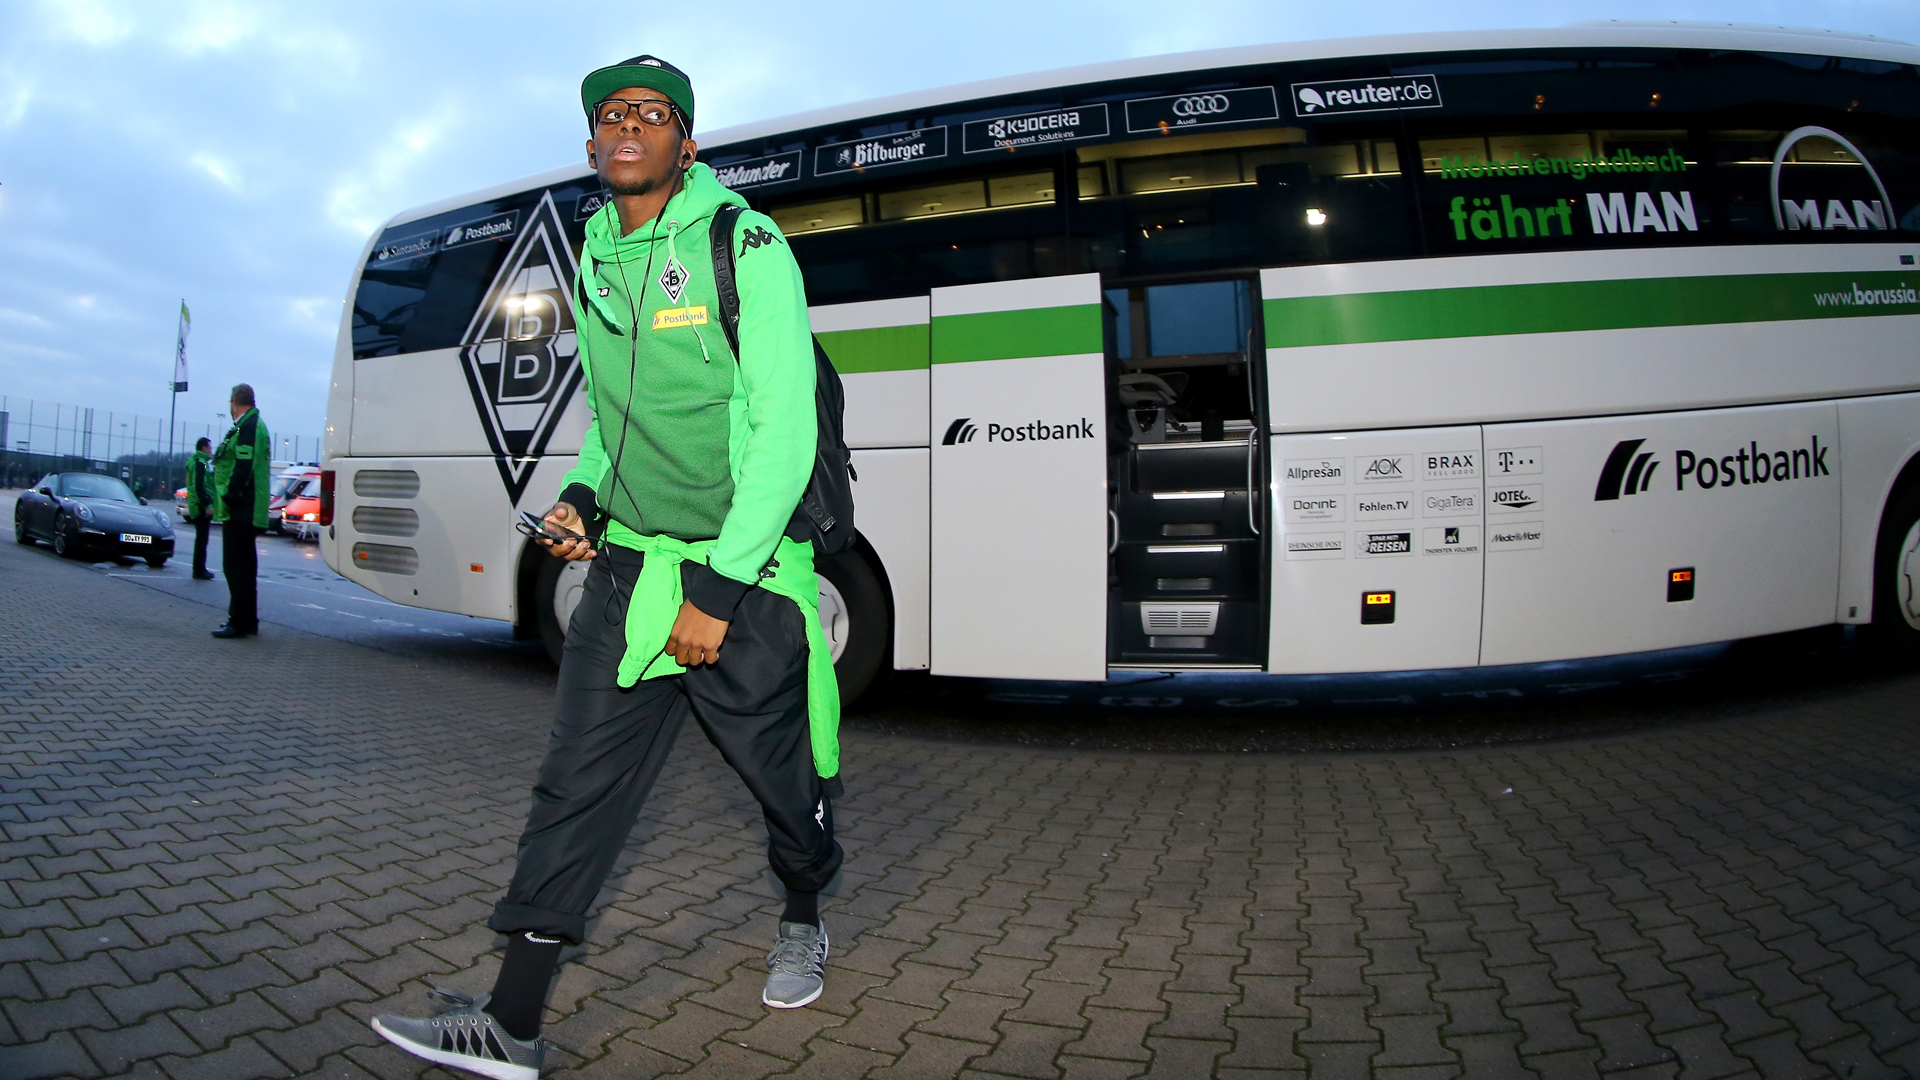 Ibrahima Traore Borussia Mönchengladbach Borussia Dortmund - Bundesliga 01.23.2016